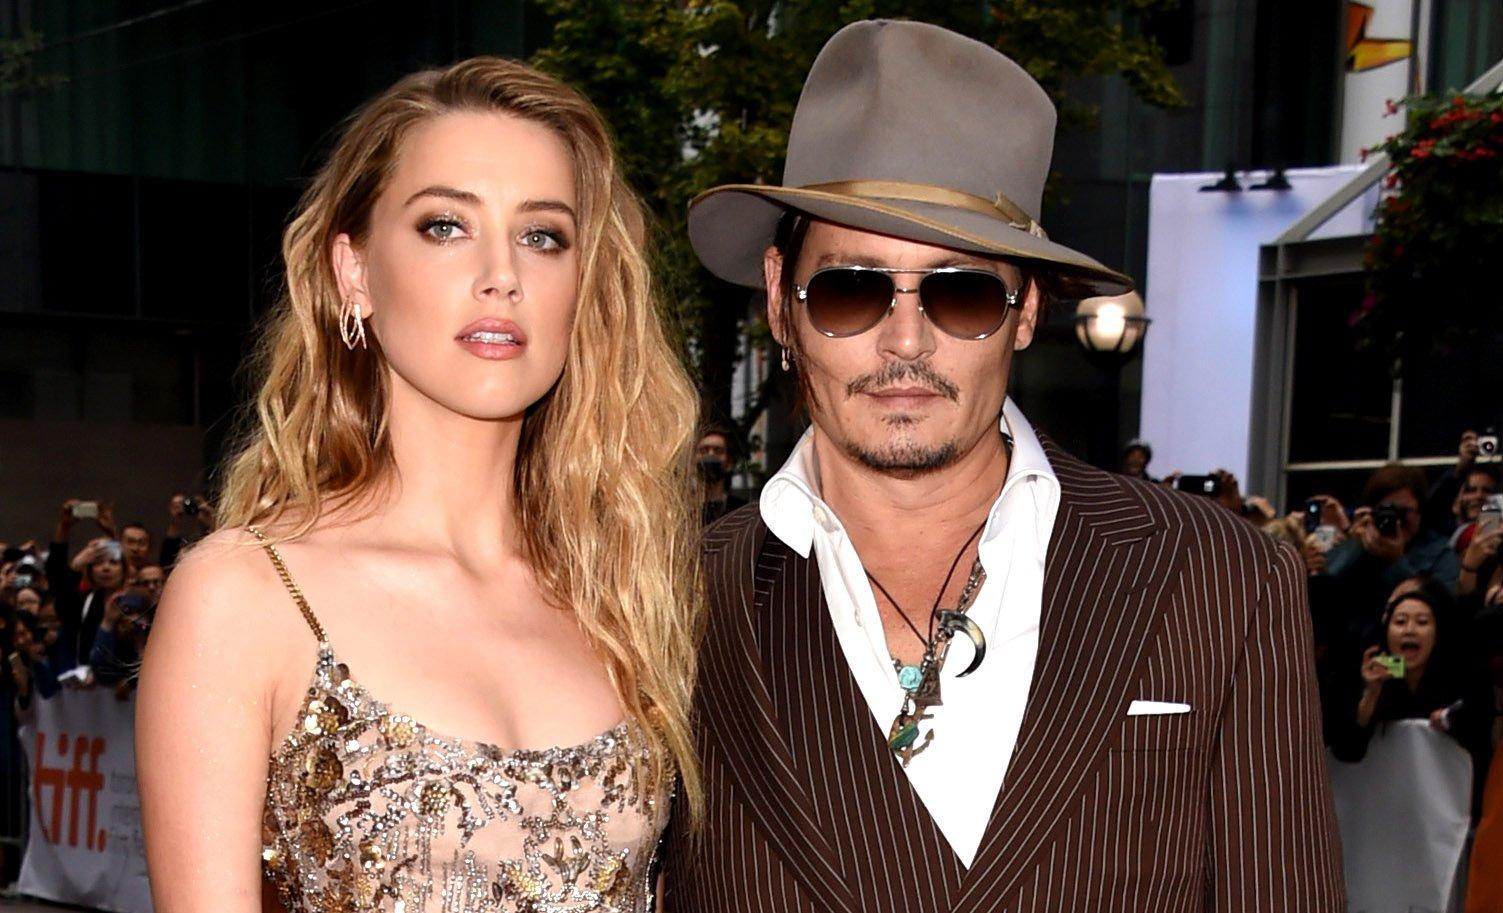 Johnny Depp's nasty texts prove his Amber Heard story isn't over yet